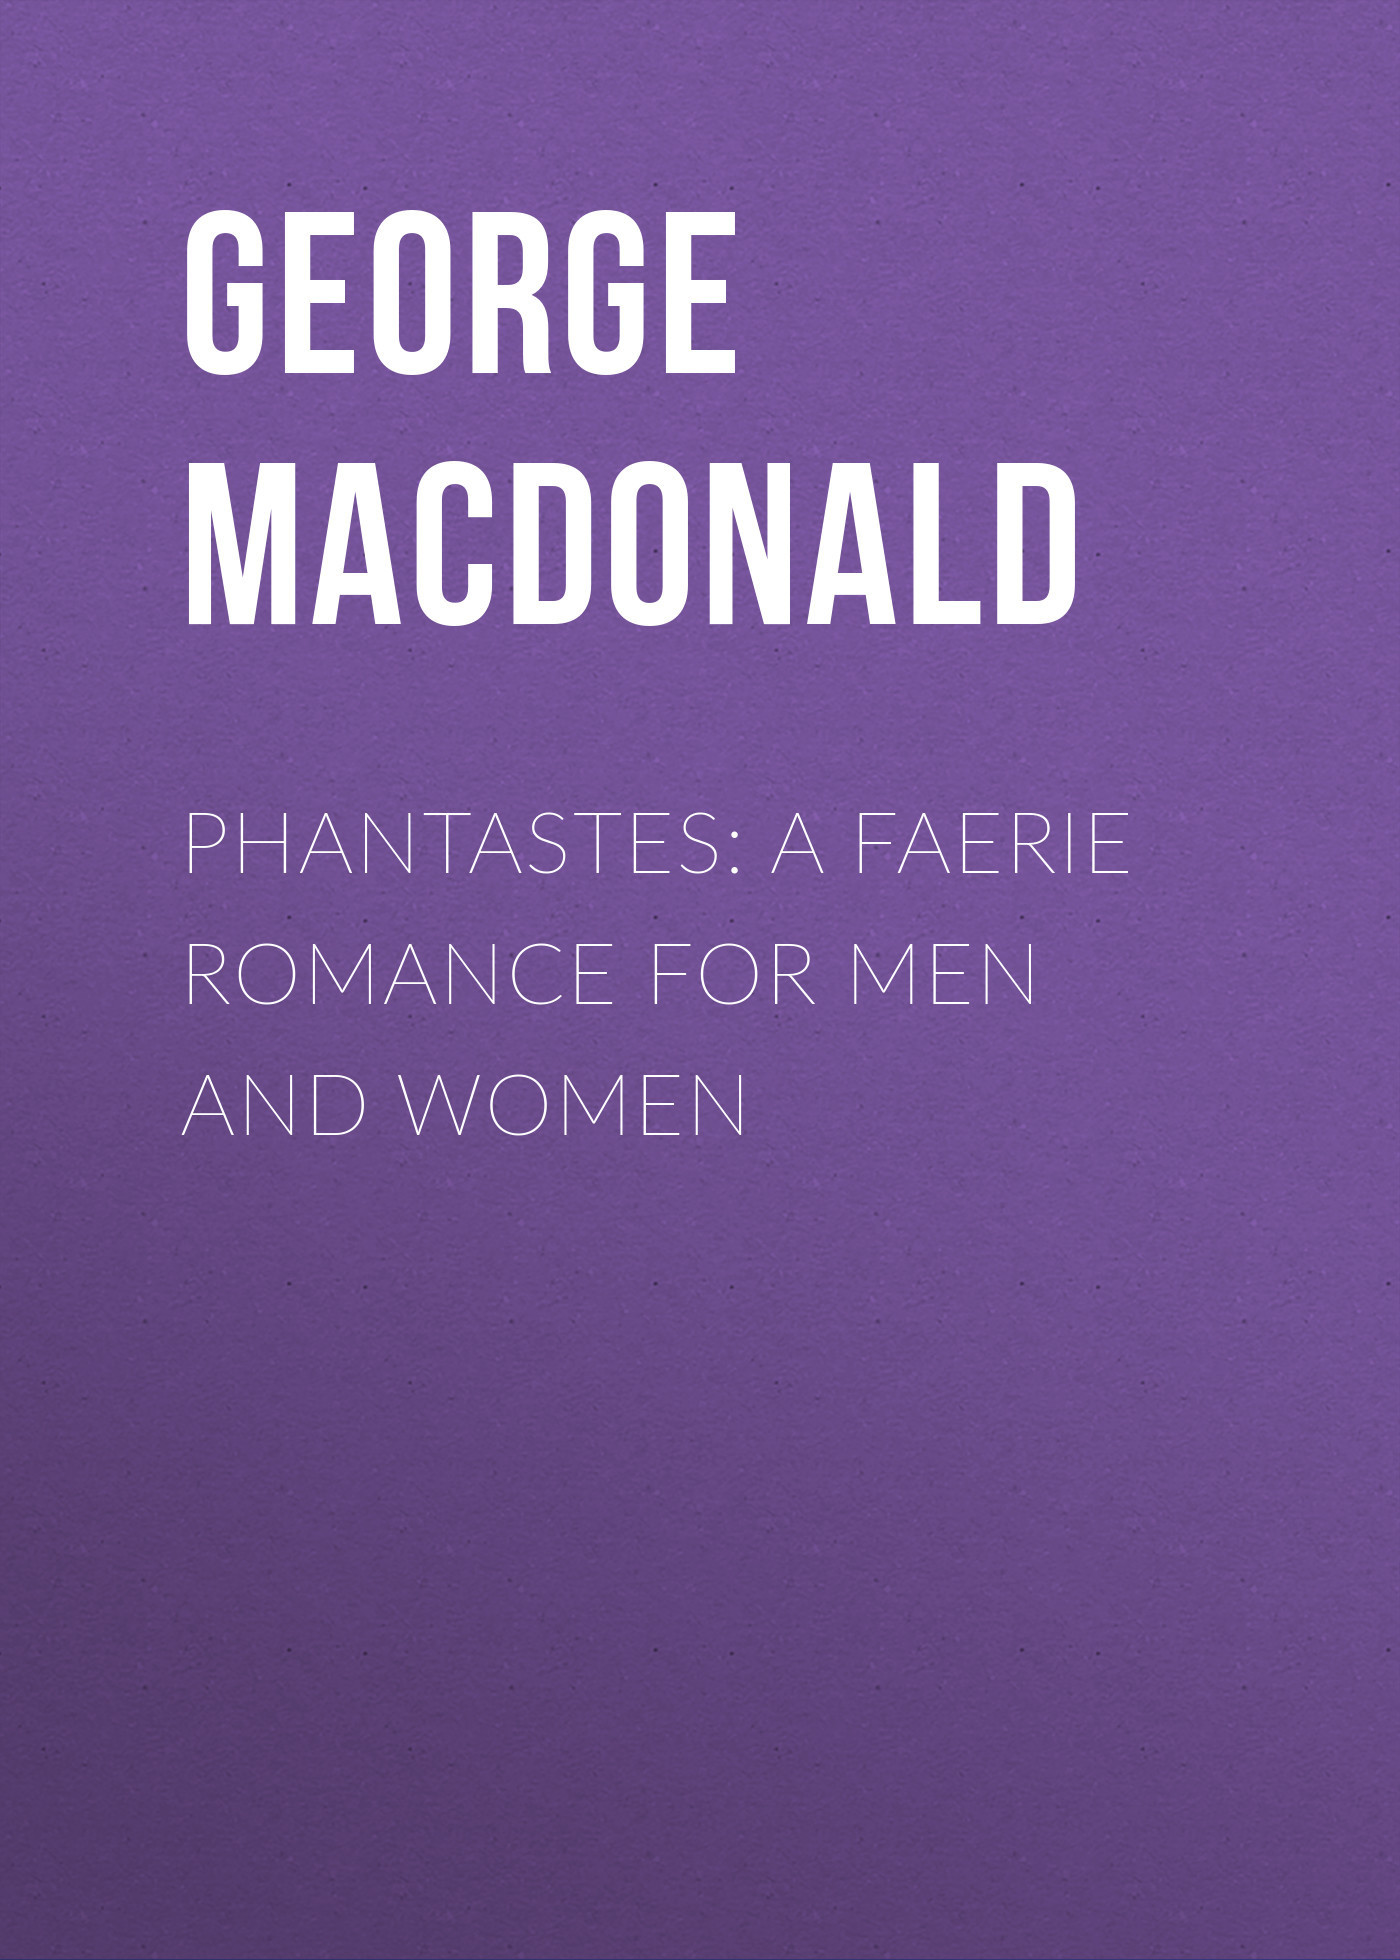 George MacDonald Phantastes: A Faerie Romance for Men and Women